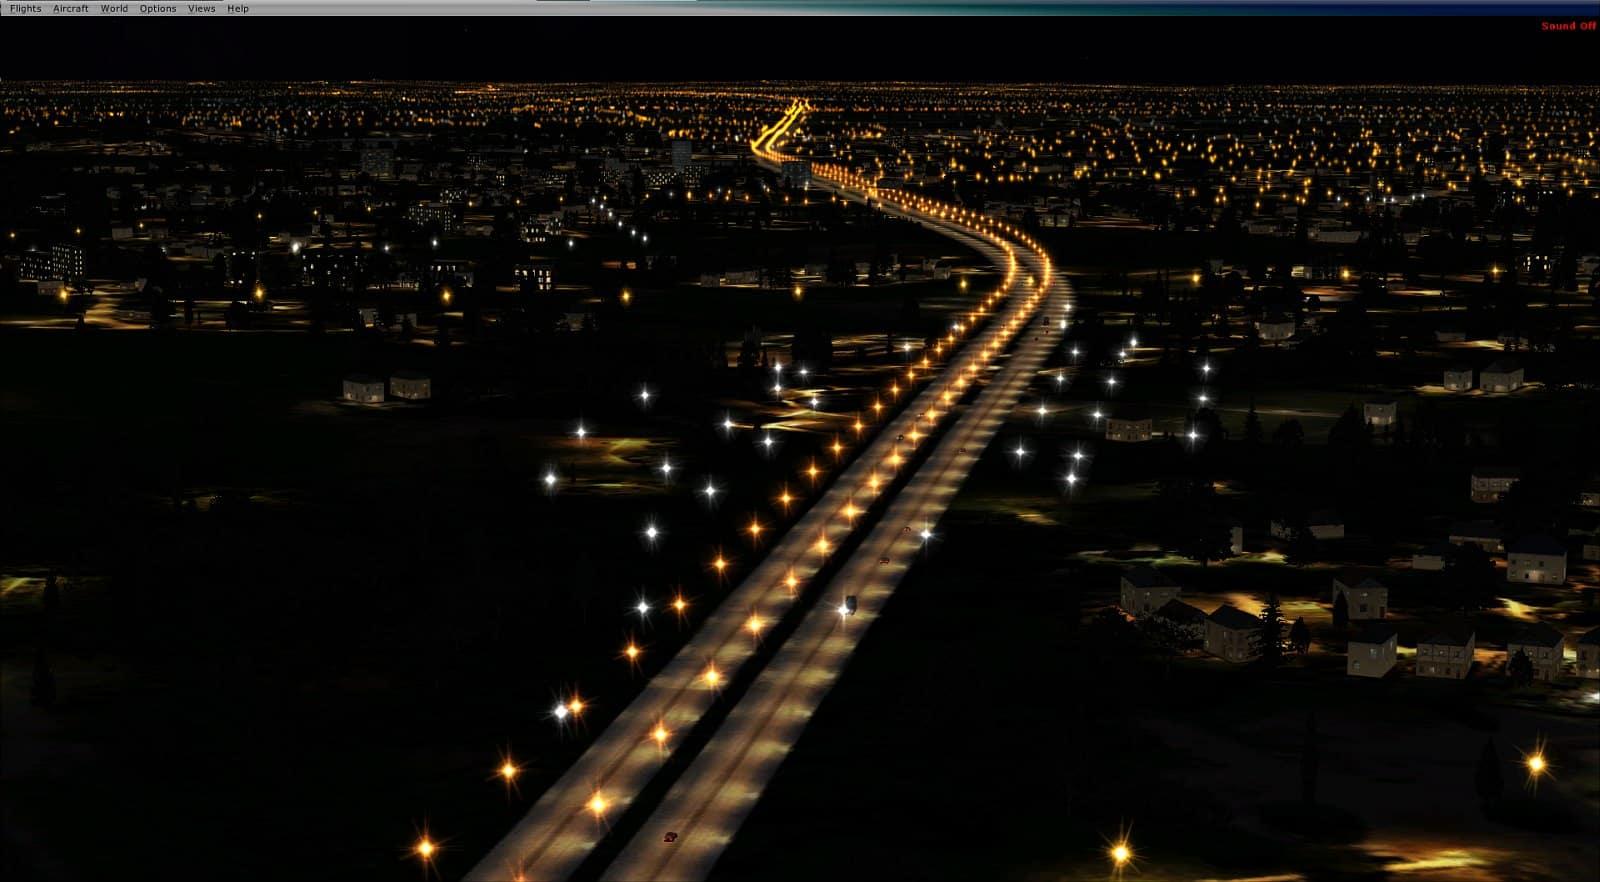 aerosoft night environment and orbx